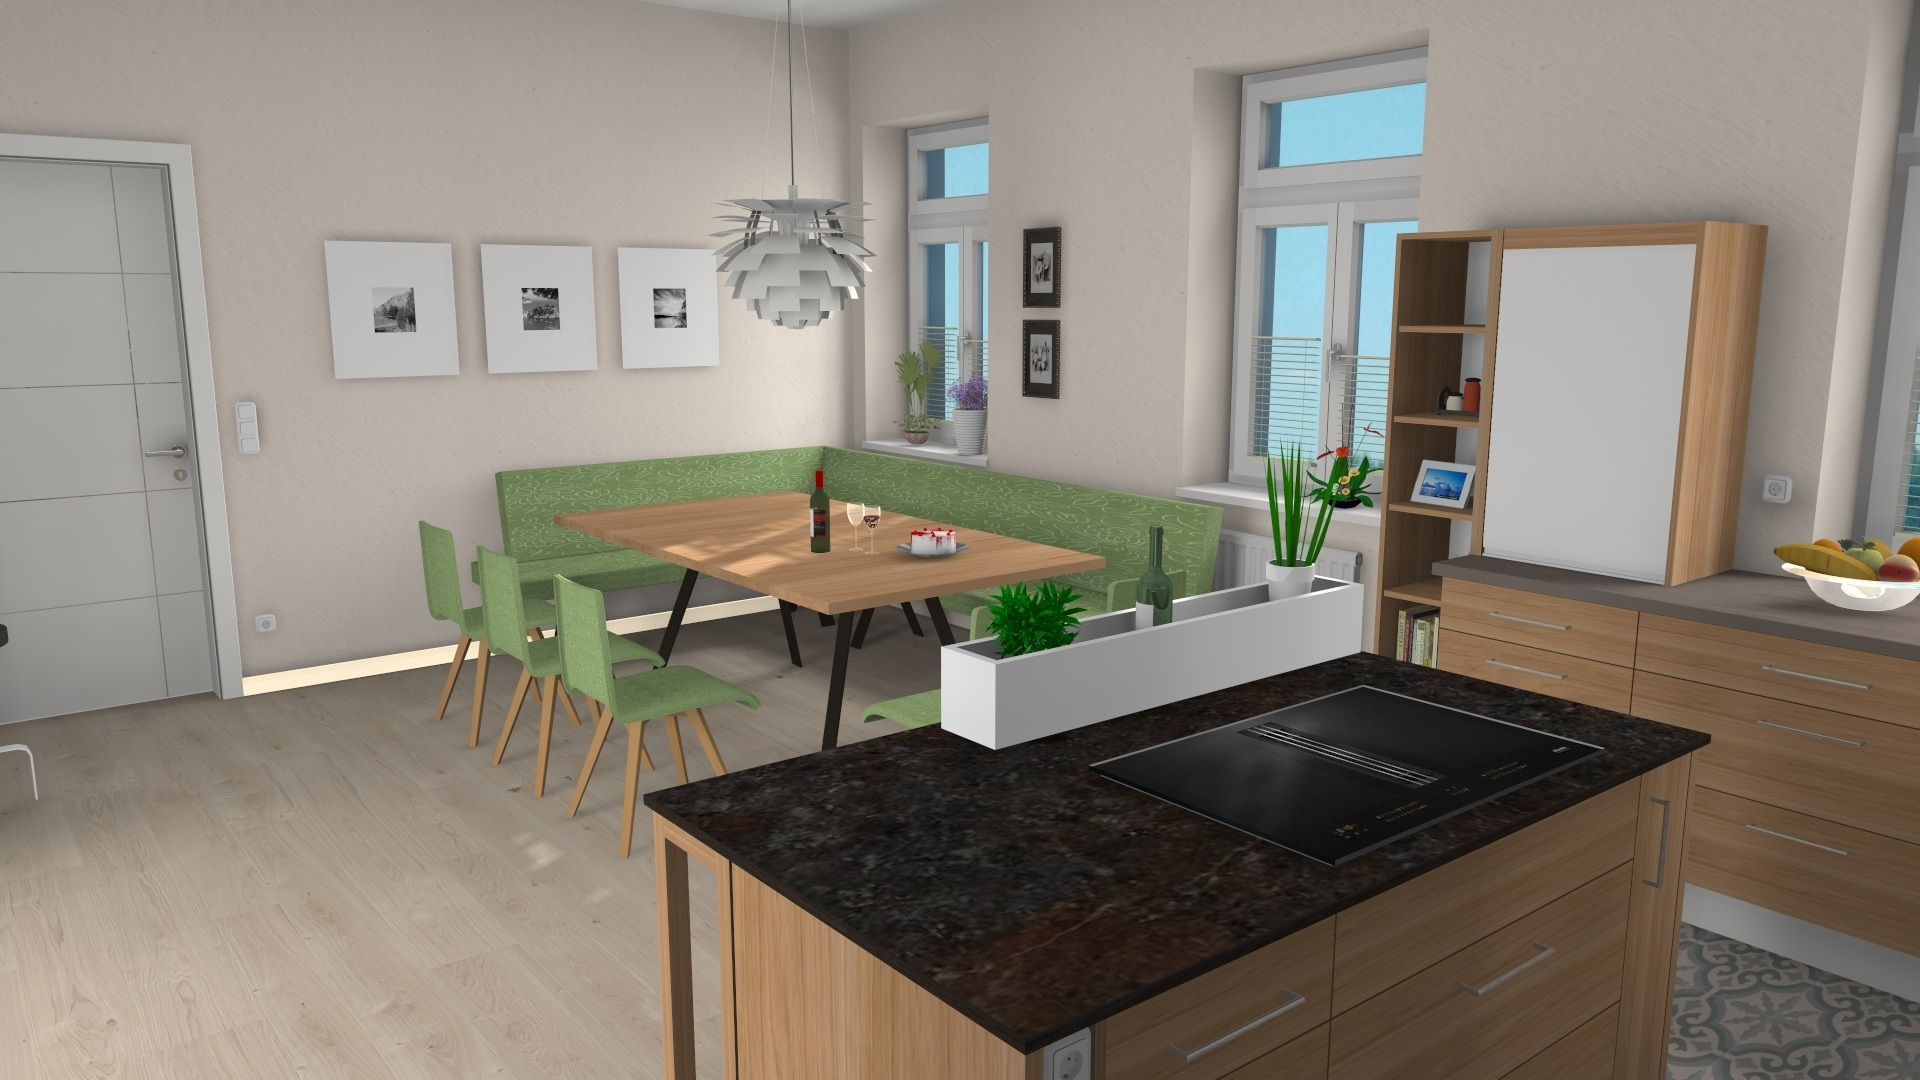 moderne k chen ideen k chenplanung z plan wien 20 n burgenland. Black Bedroom Furniture Sets. Home Design Ideas